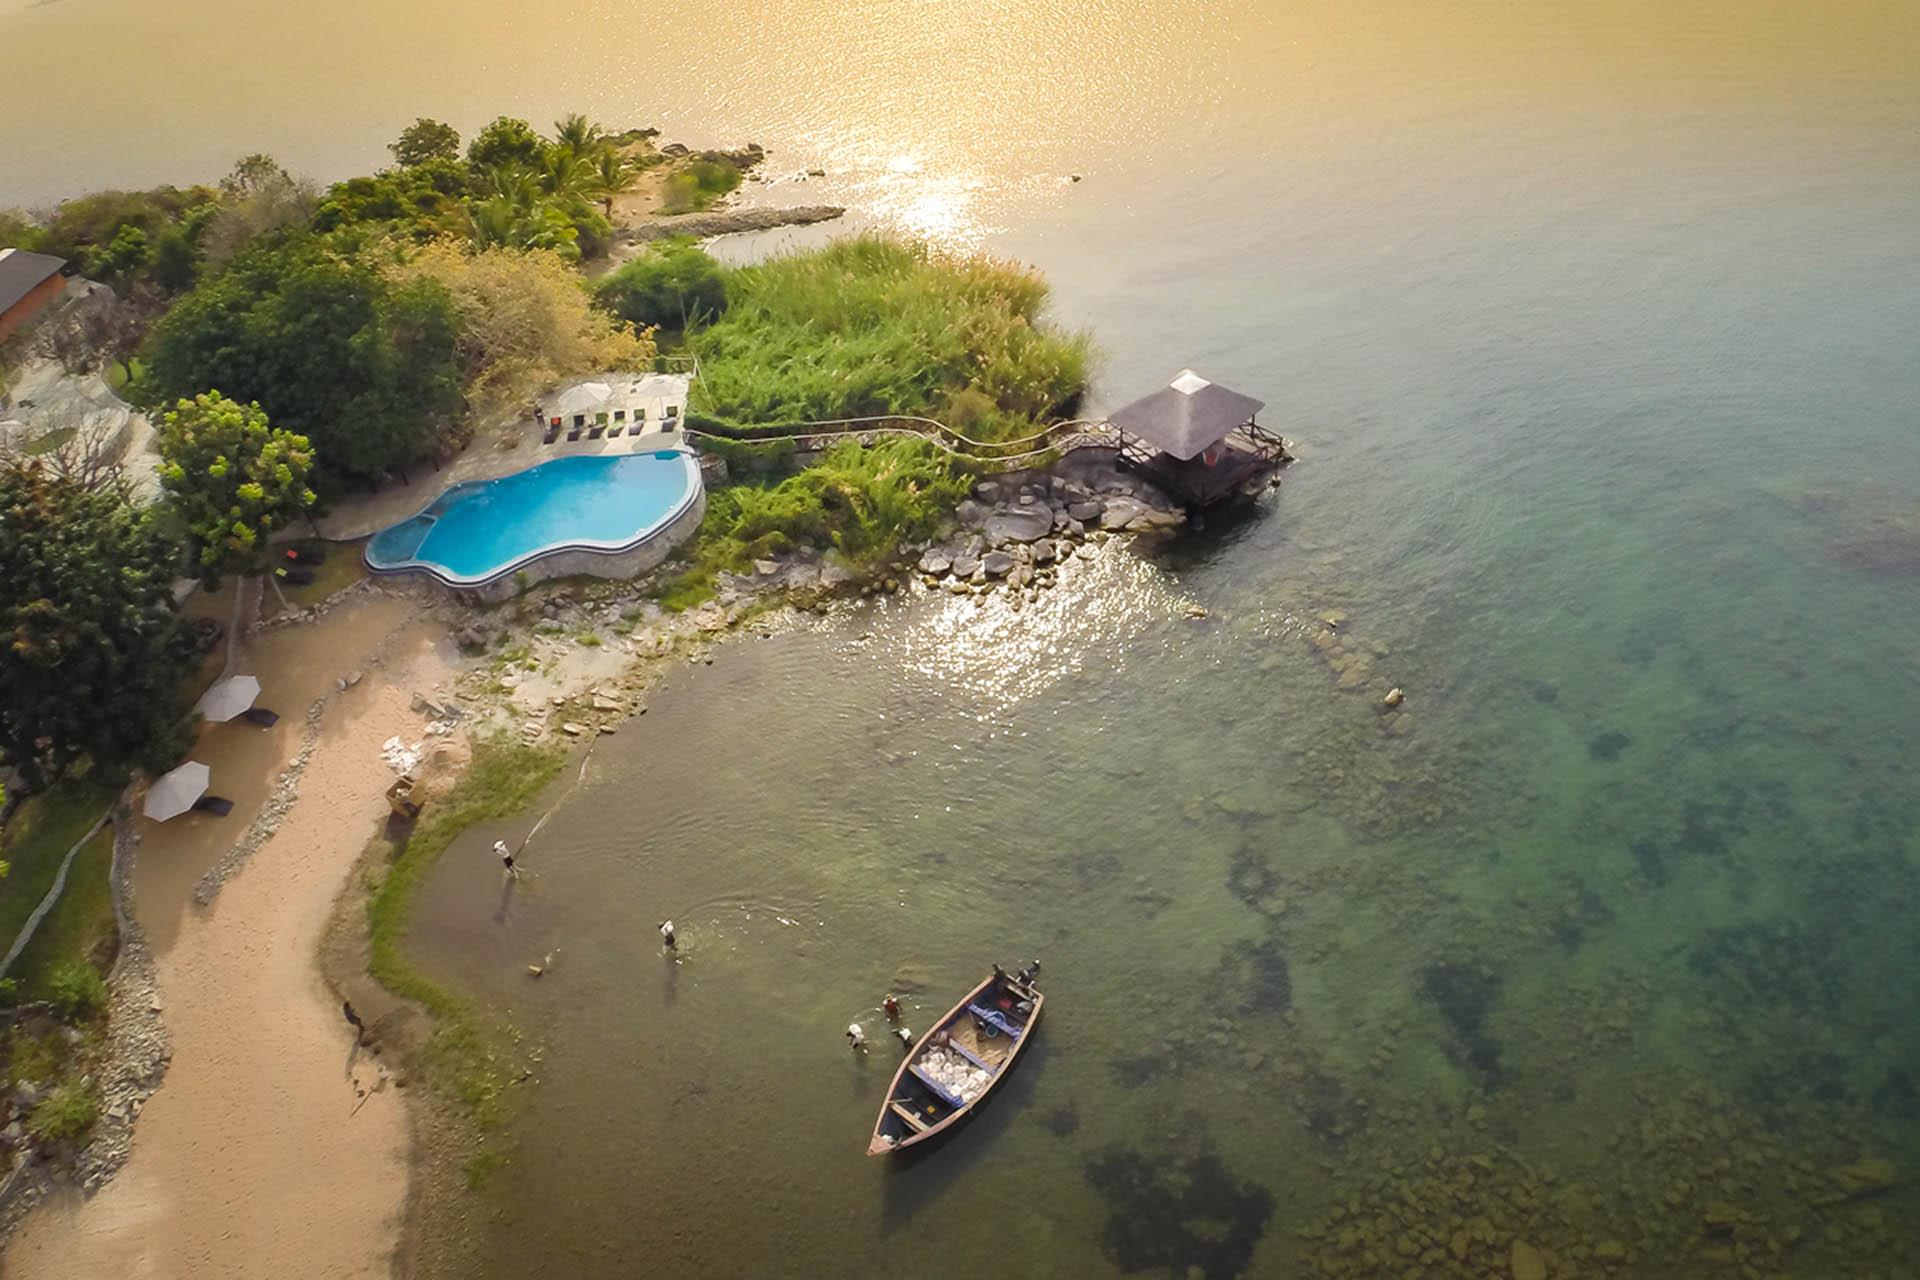 liwonde national park malawian-style-malawi-adventures-experiences-holidays-specialist-tour-operator-blue-zebra-lodge-nankoma-island-view